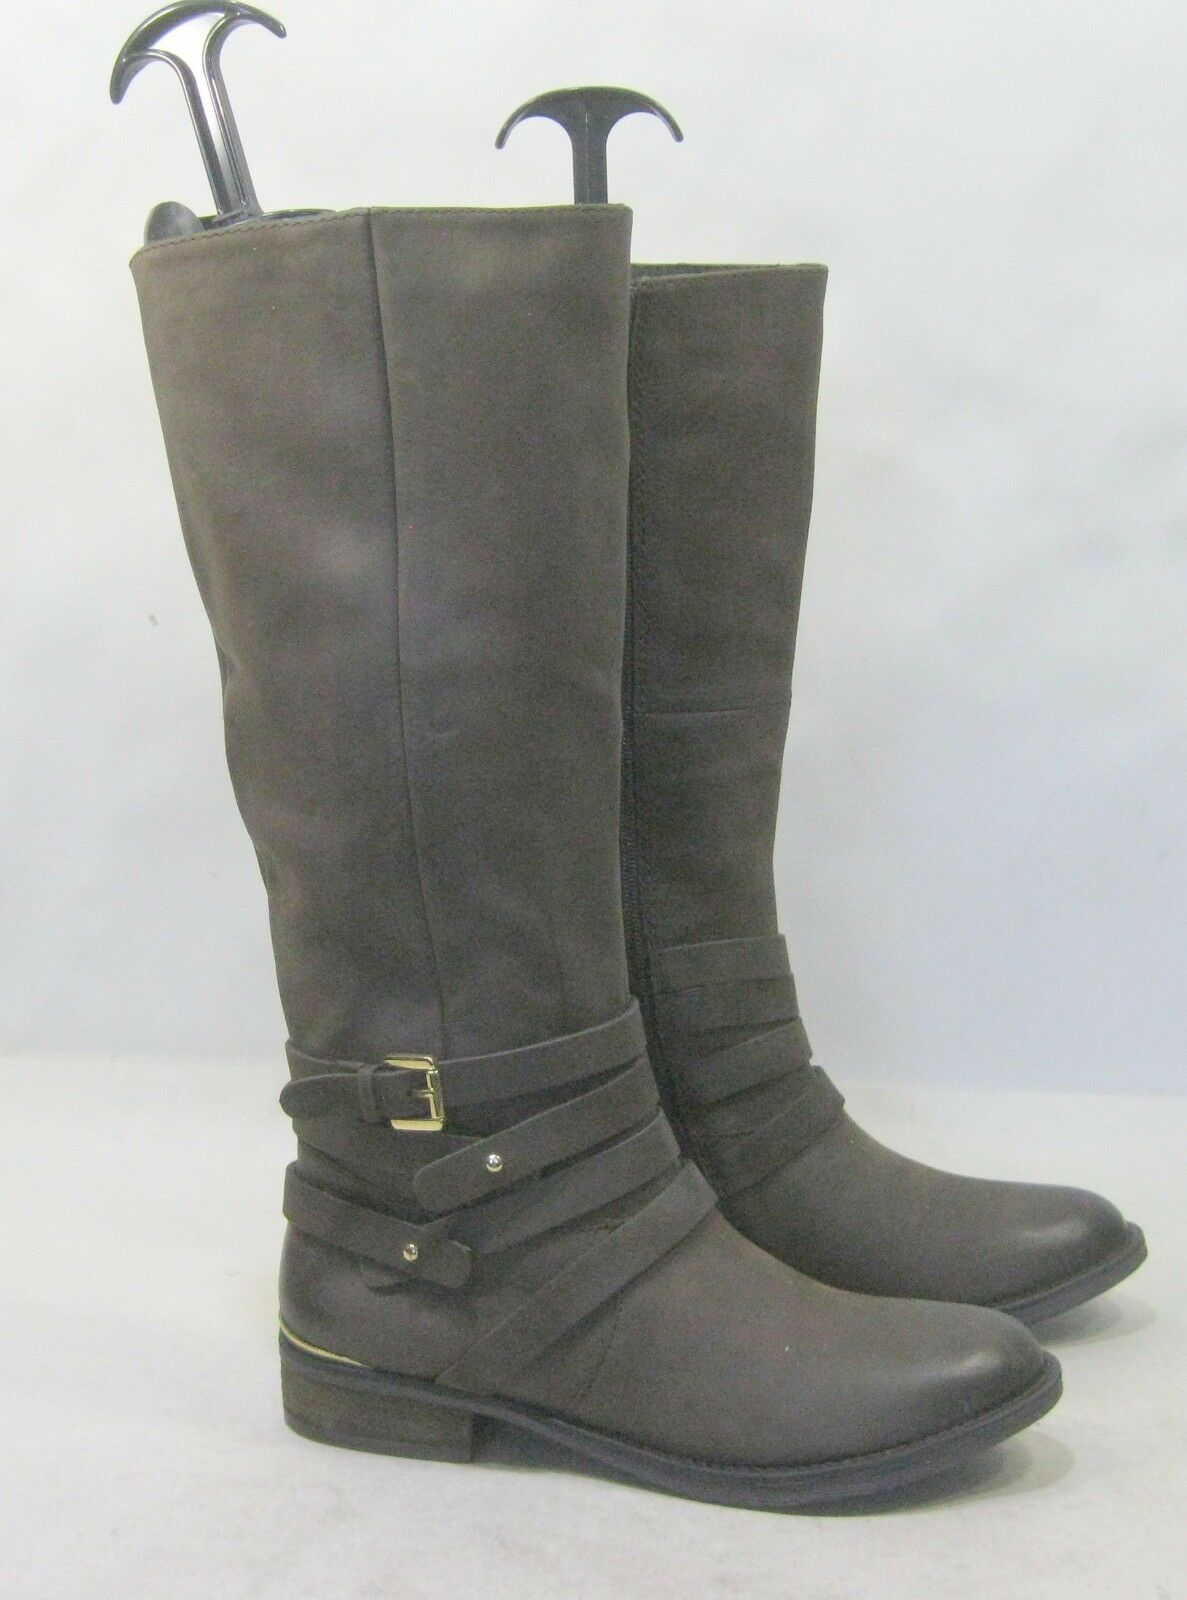 Steve Madden Brown Low Heel Round Toe Comfortable Pelle Knee Boot Size 7.5